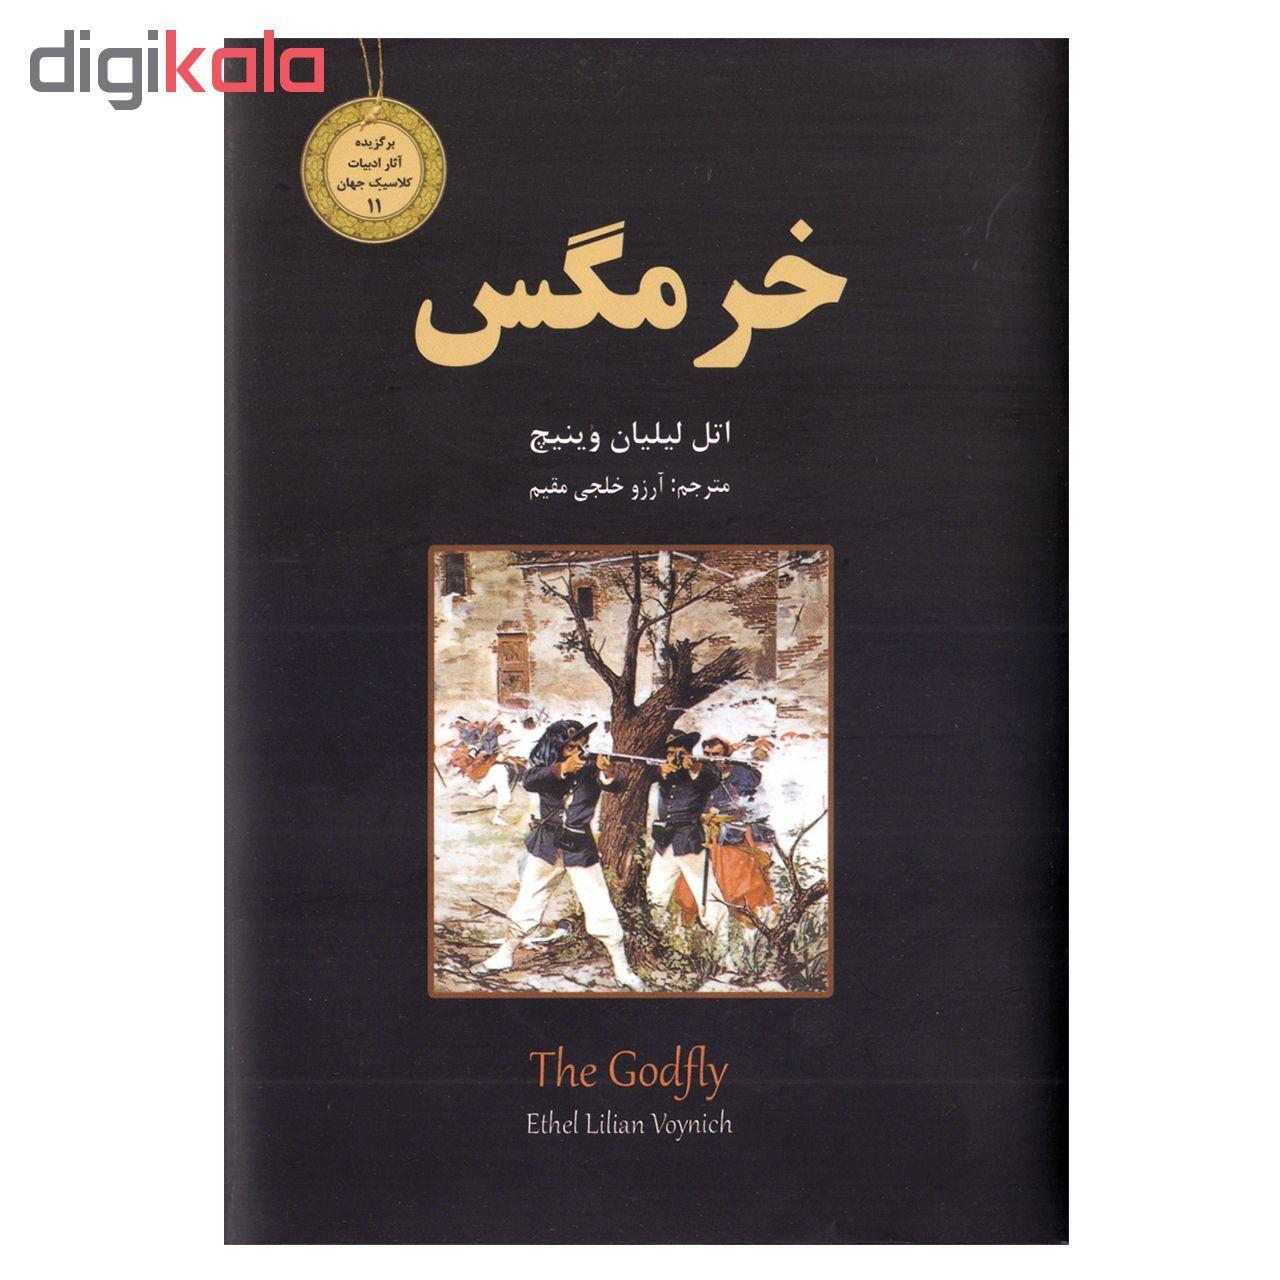 کتاب خرمگس اثر اتل لیلیان وینیچ نشر نیک فرجام قطع جیبی main 1 1